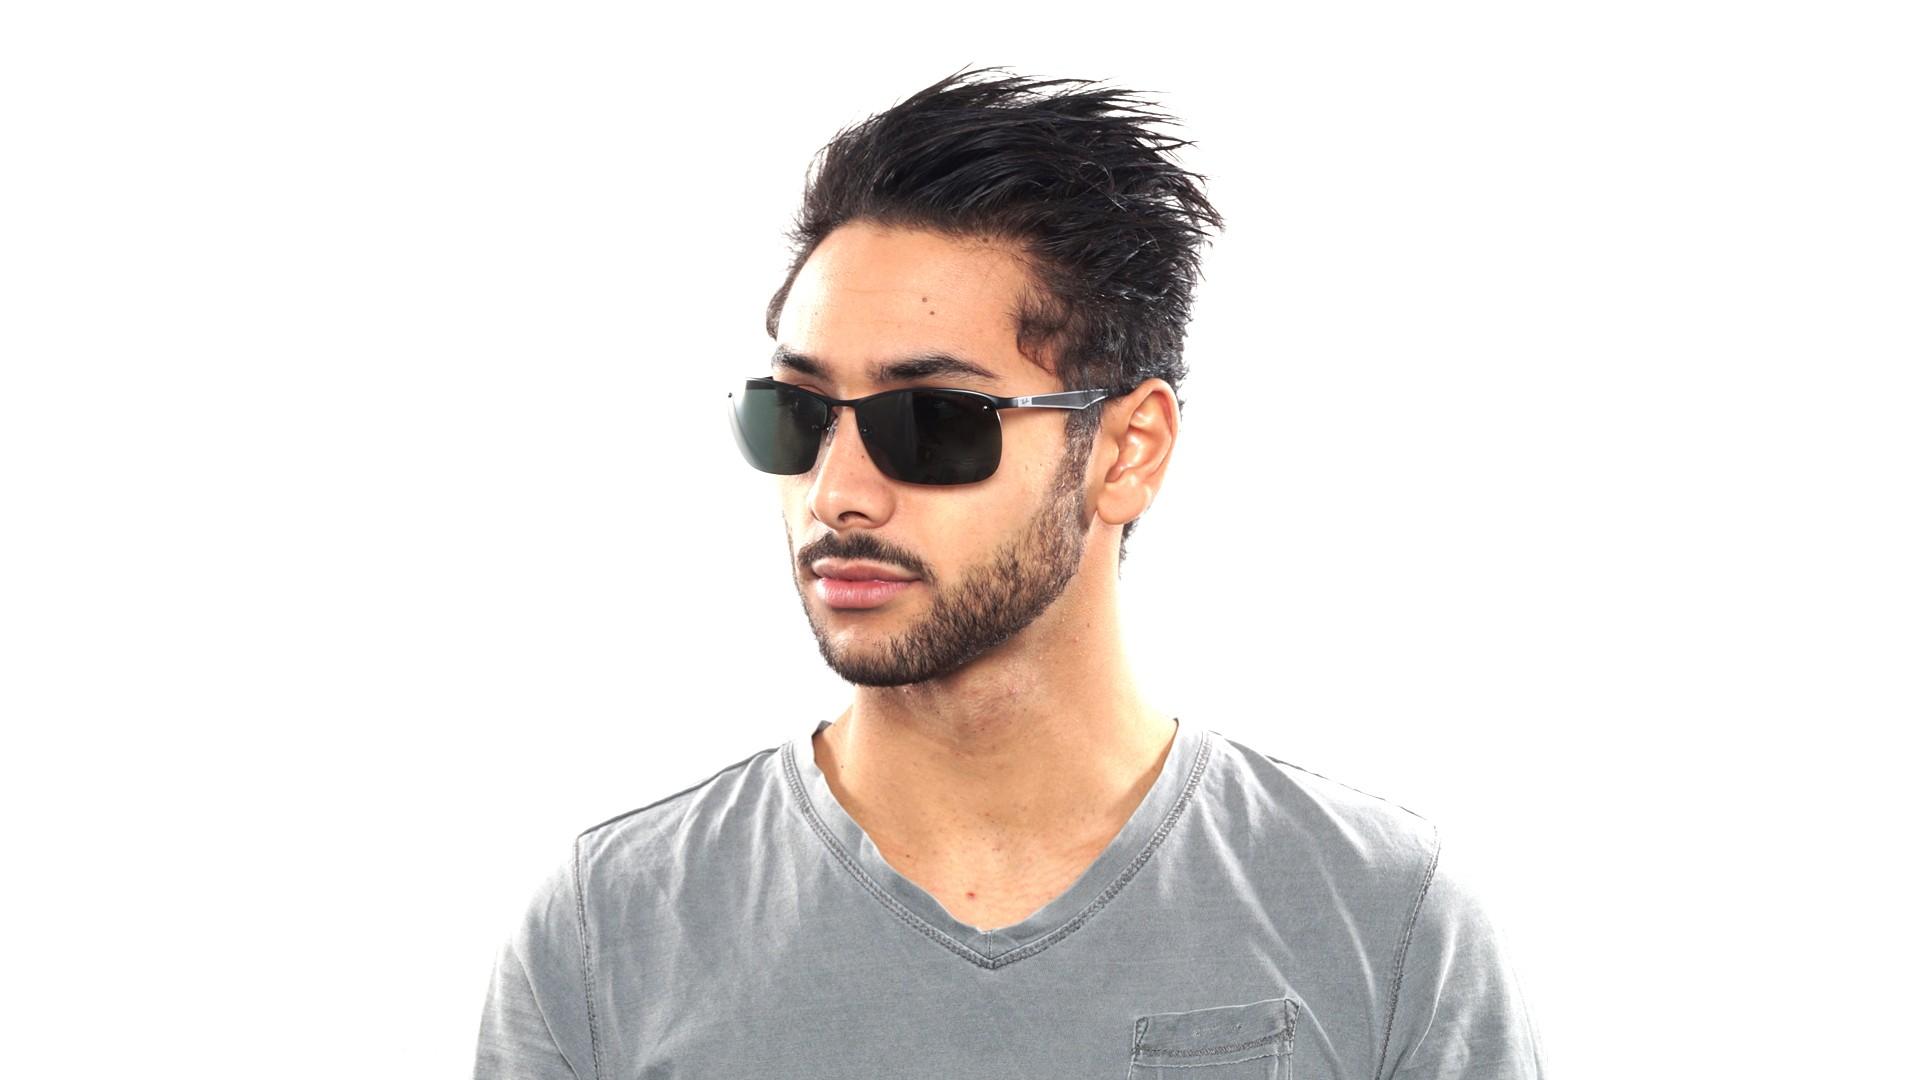 d916858d4ac Sunglasses Ray-Ban RB3550 006 71 64-15 Matte Black Large